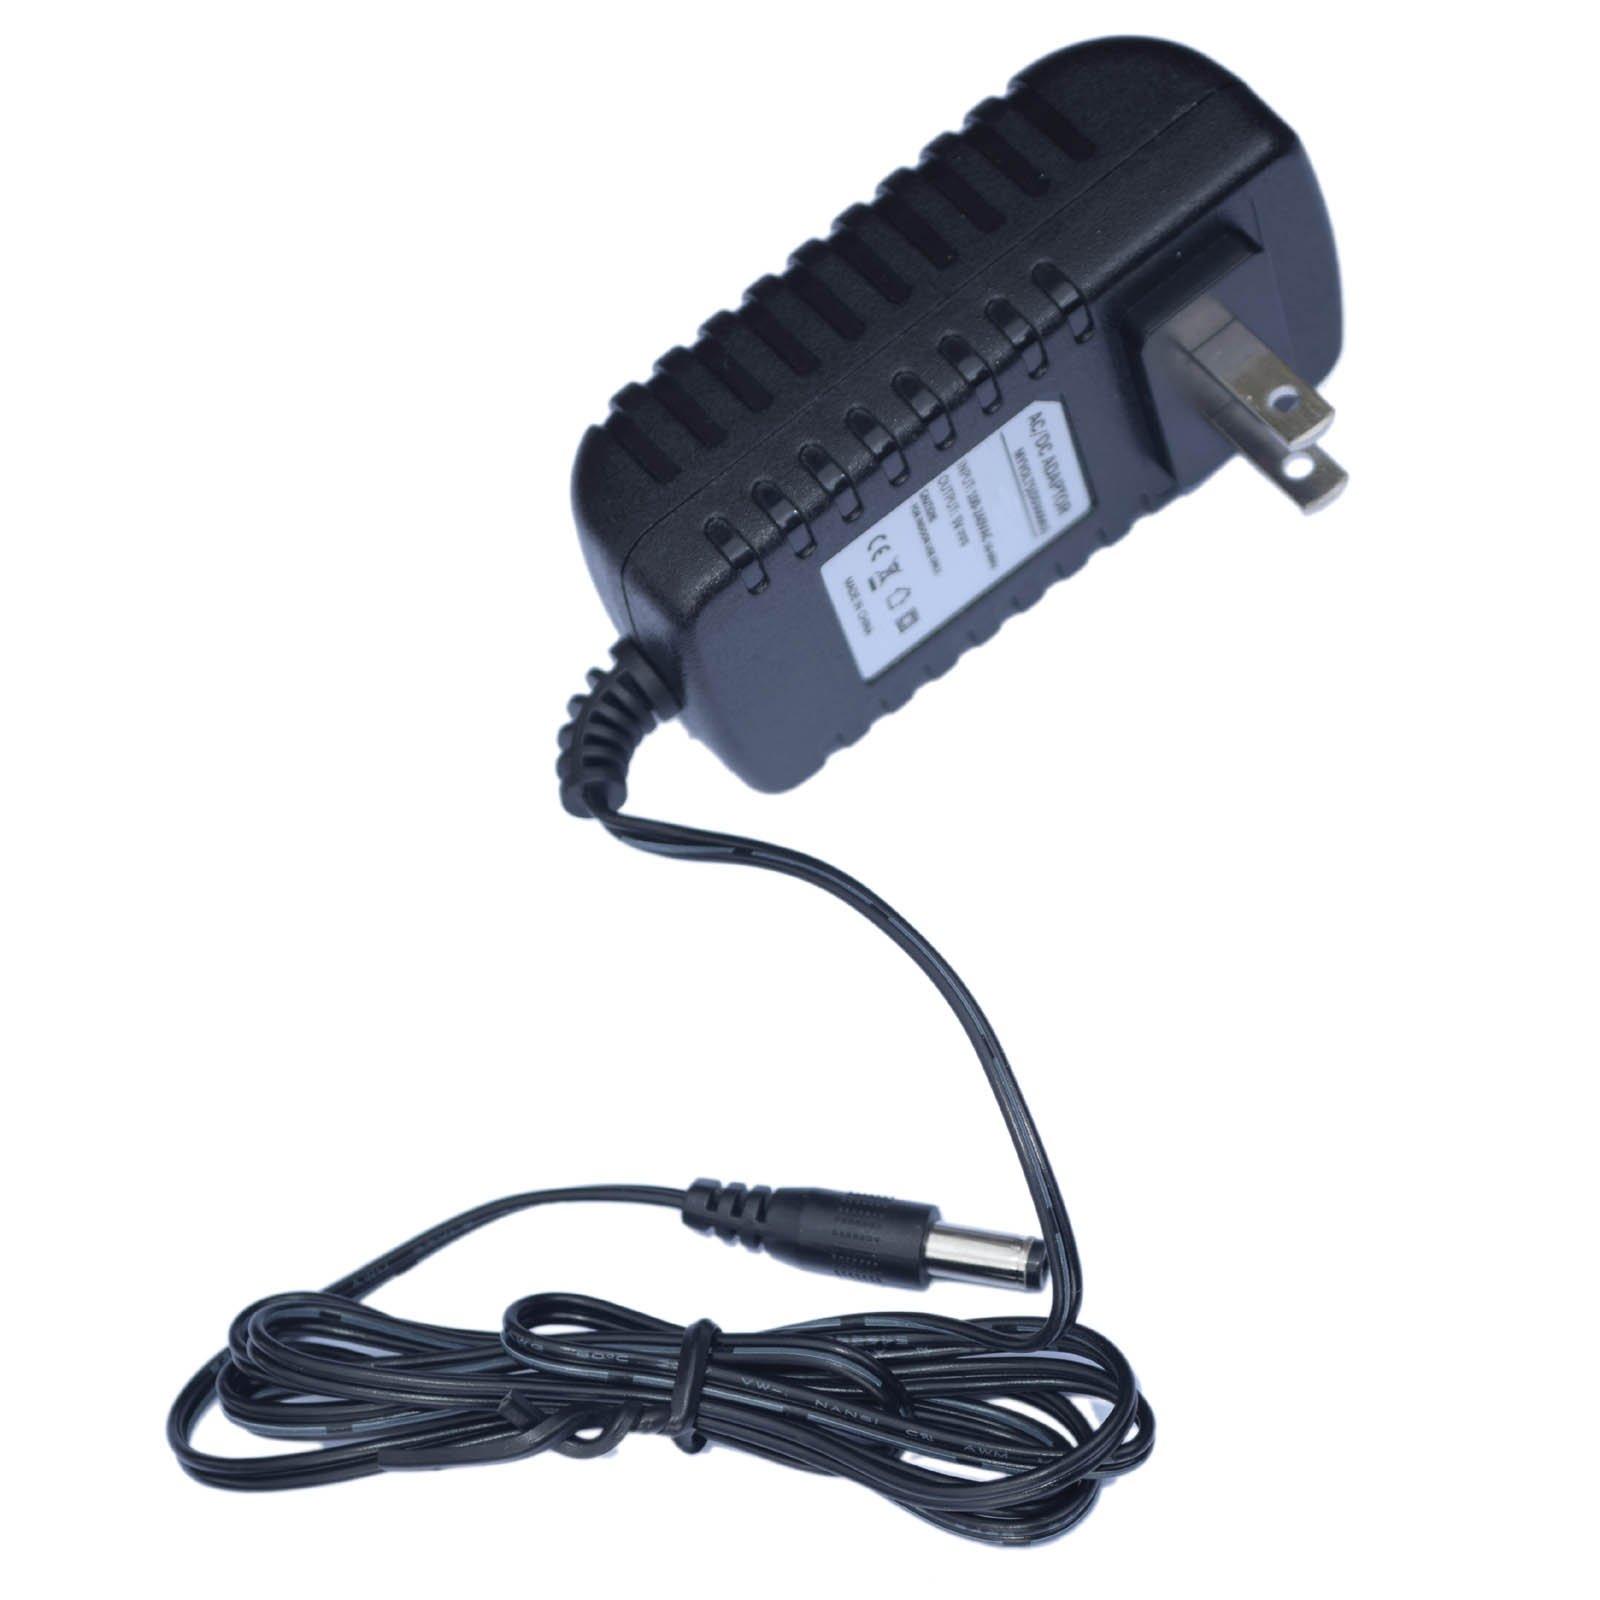 5V Roku 2 3100X Media player replacement power supply adaptor - US plug